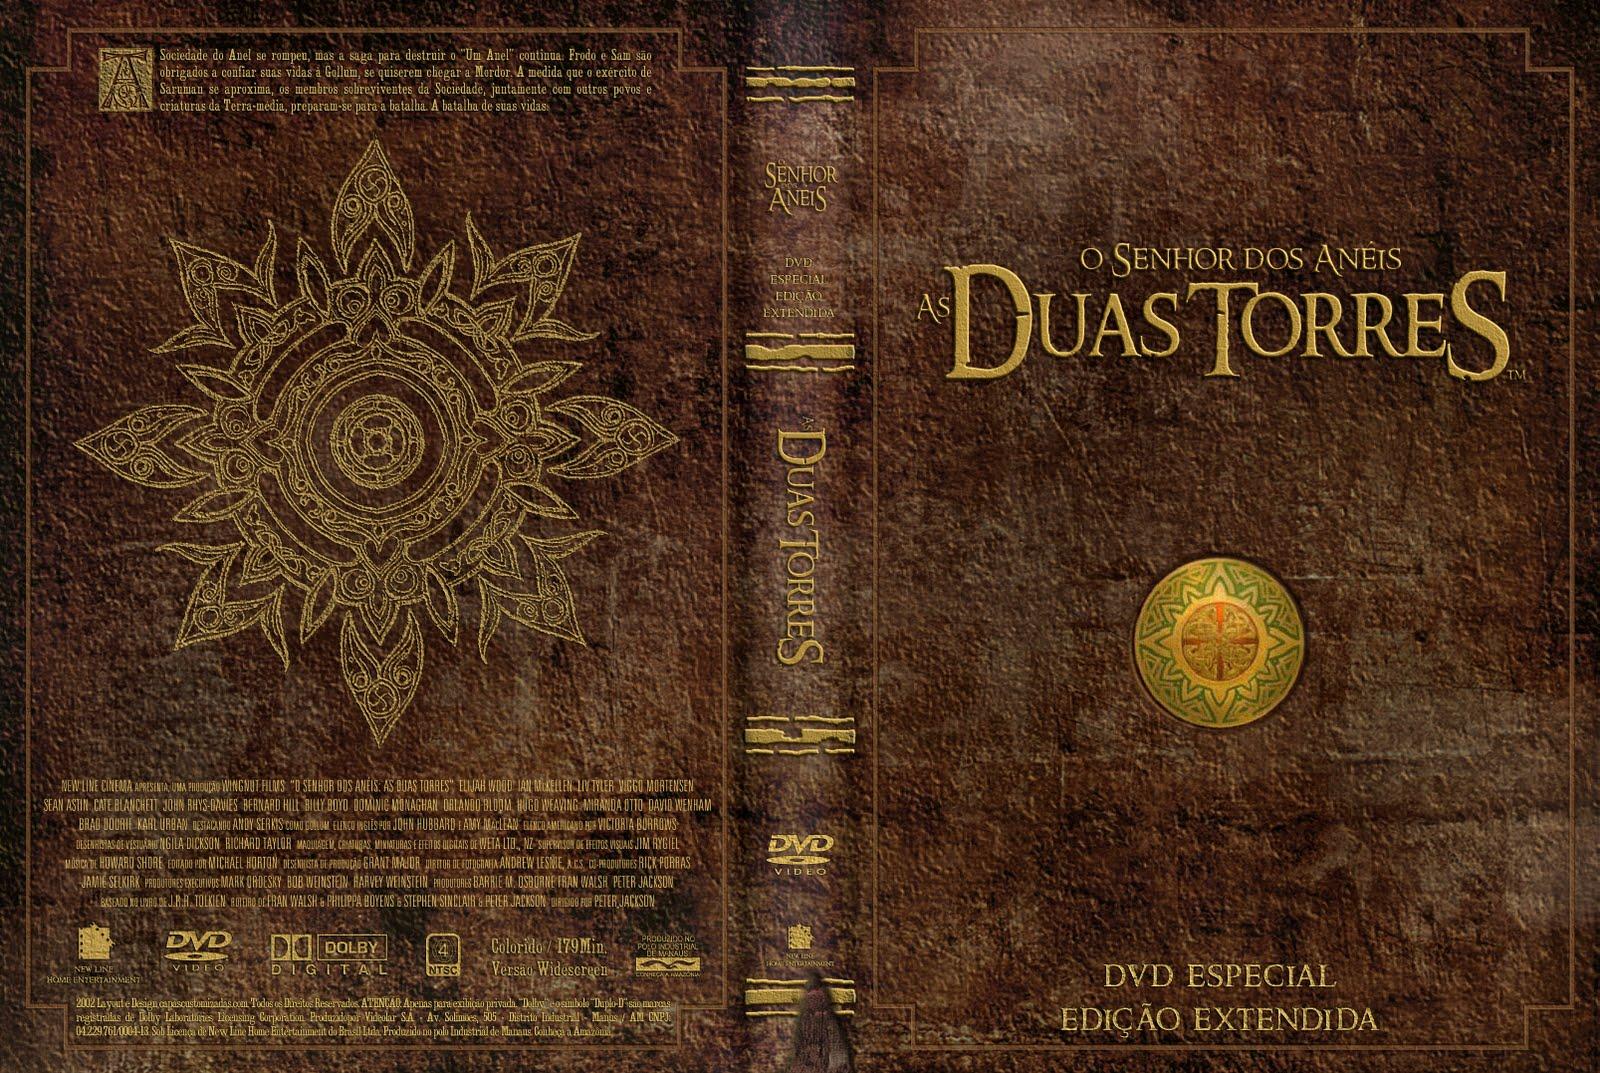 http://2.bp.blogspot.com/-XSfK5rN9jhs/TrhA4-_u2NI/AAAAAAAAAz4/qWg2XXNSOVc/s1600/O+Senhor+Dos+An%25C3%25A9is+Trilogia+%2528Vers%25C3%25A3o+Extendida%2529+-+As+Duas+Torres.jpg